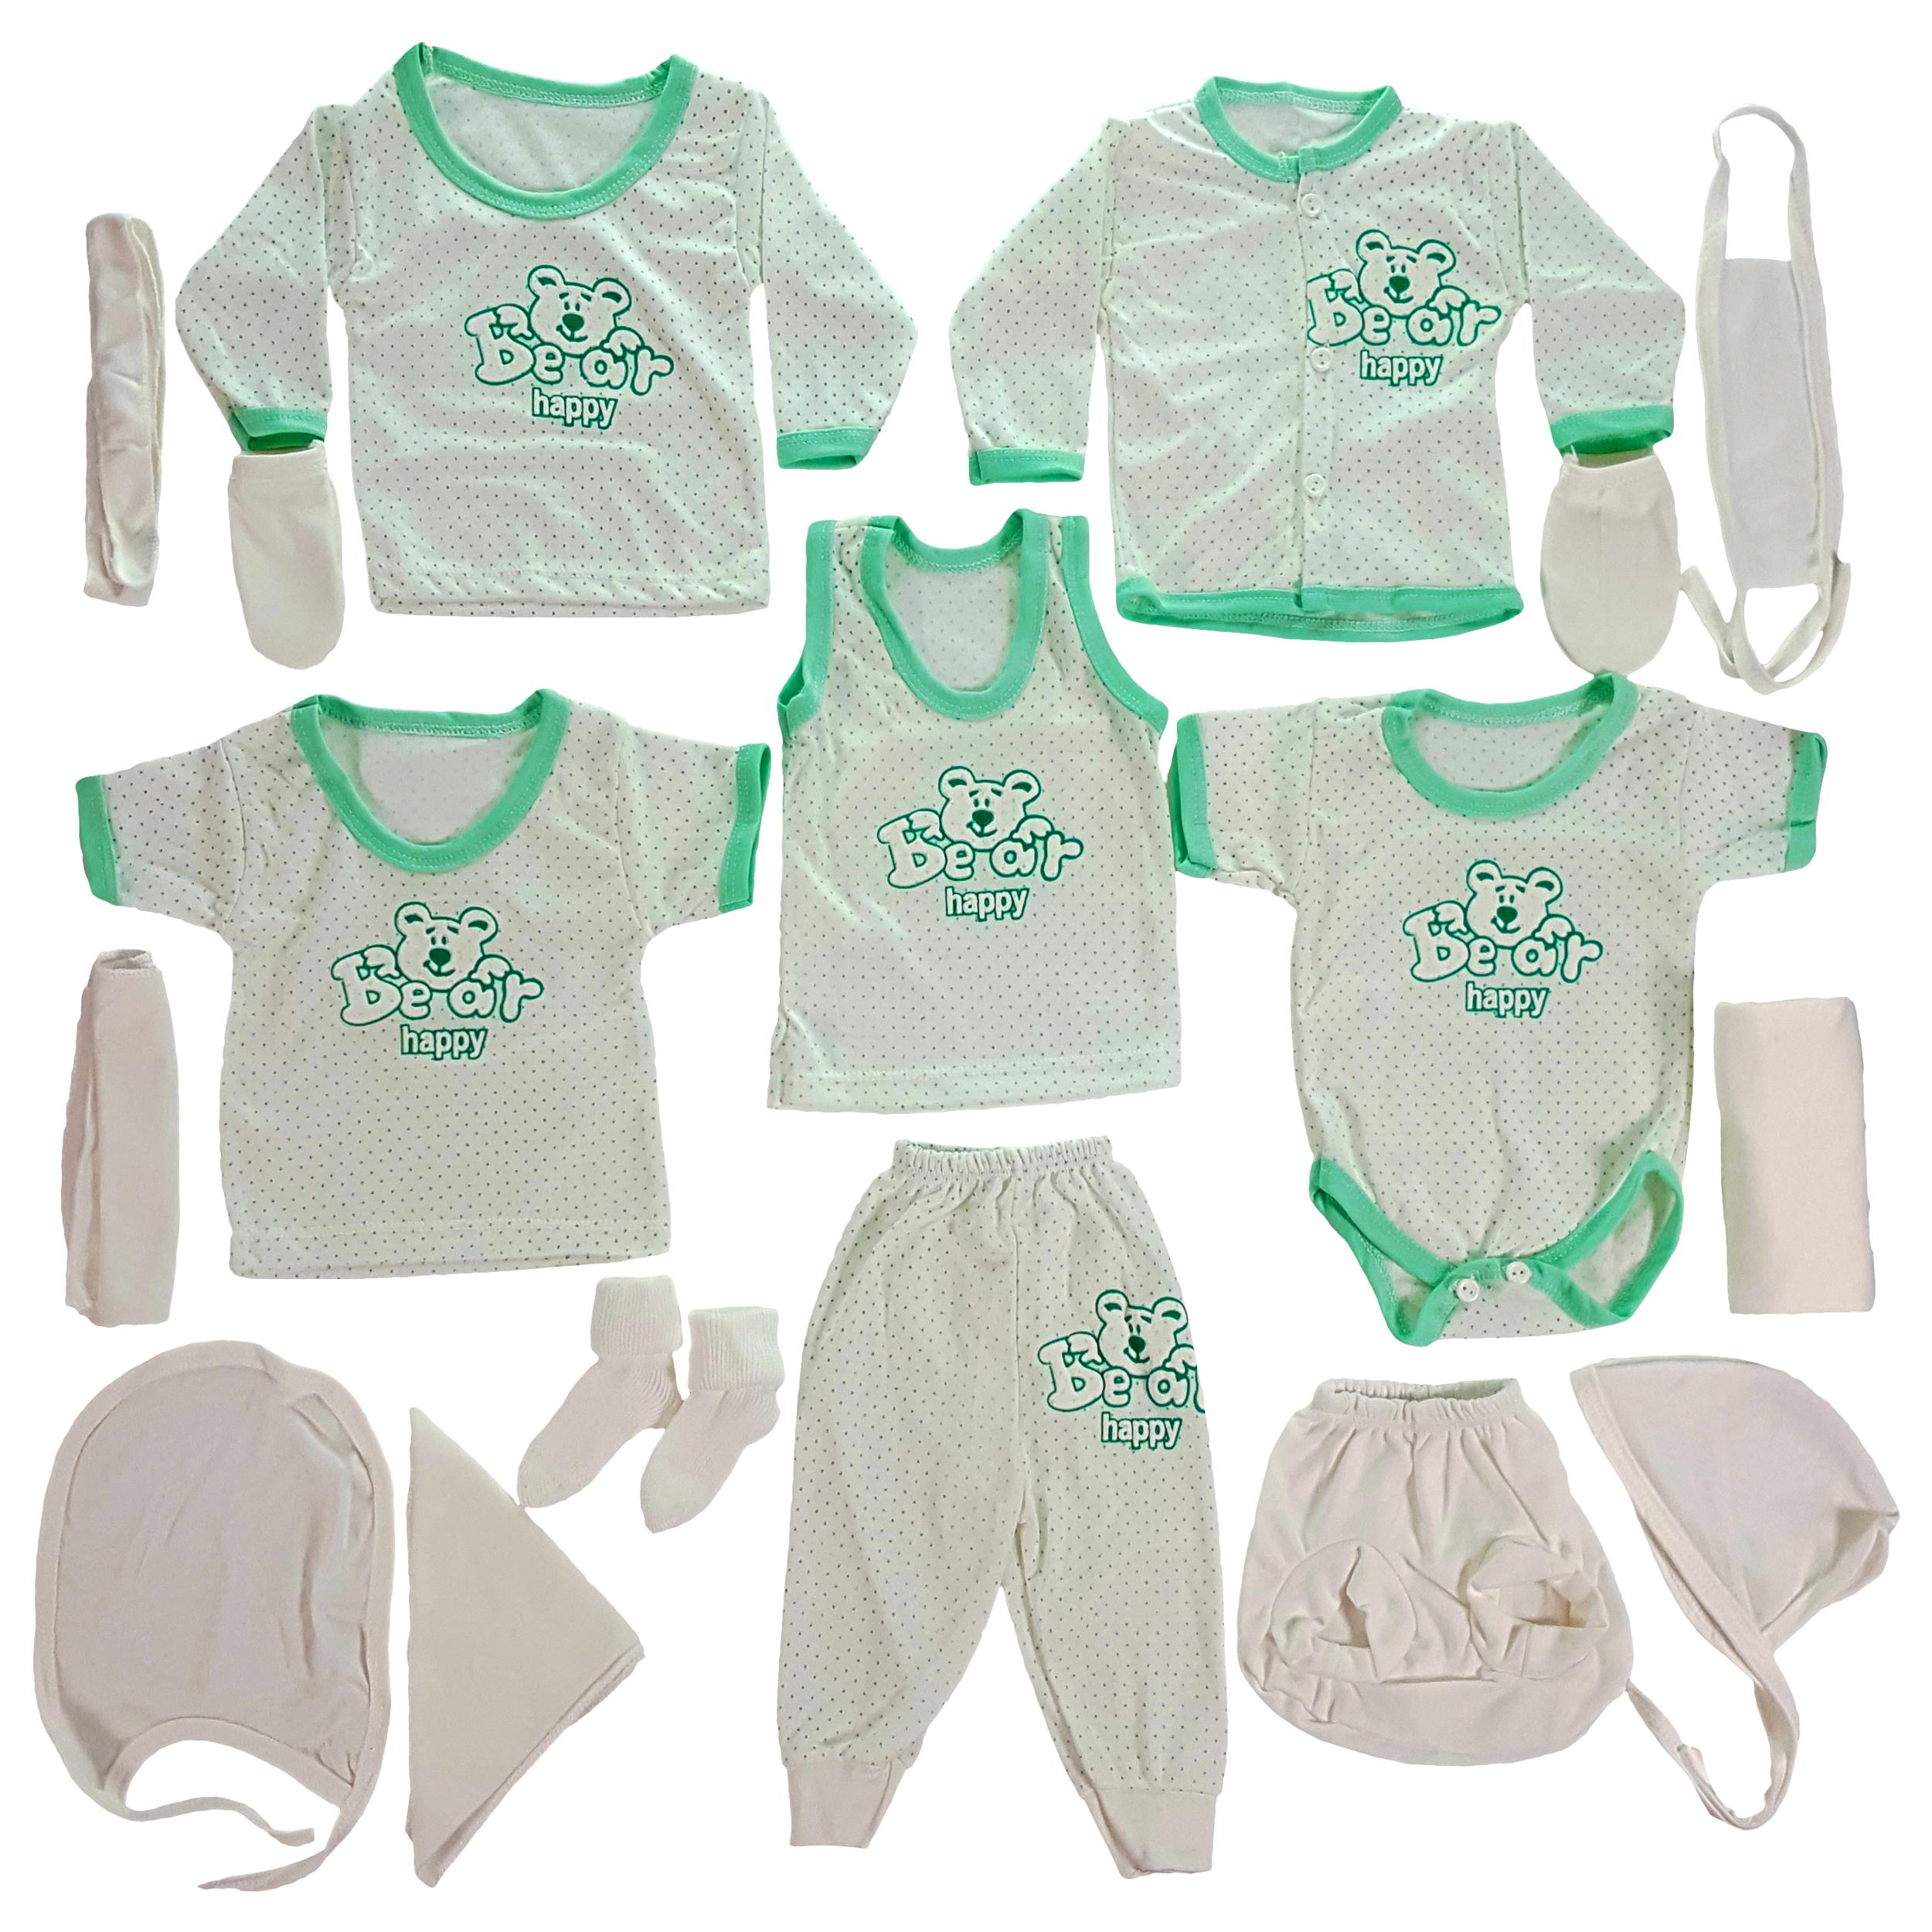 ست 19 تکه لباس نوزادی کد sh01